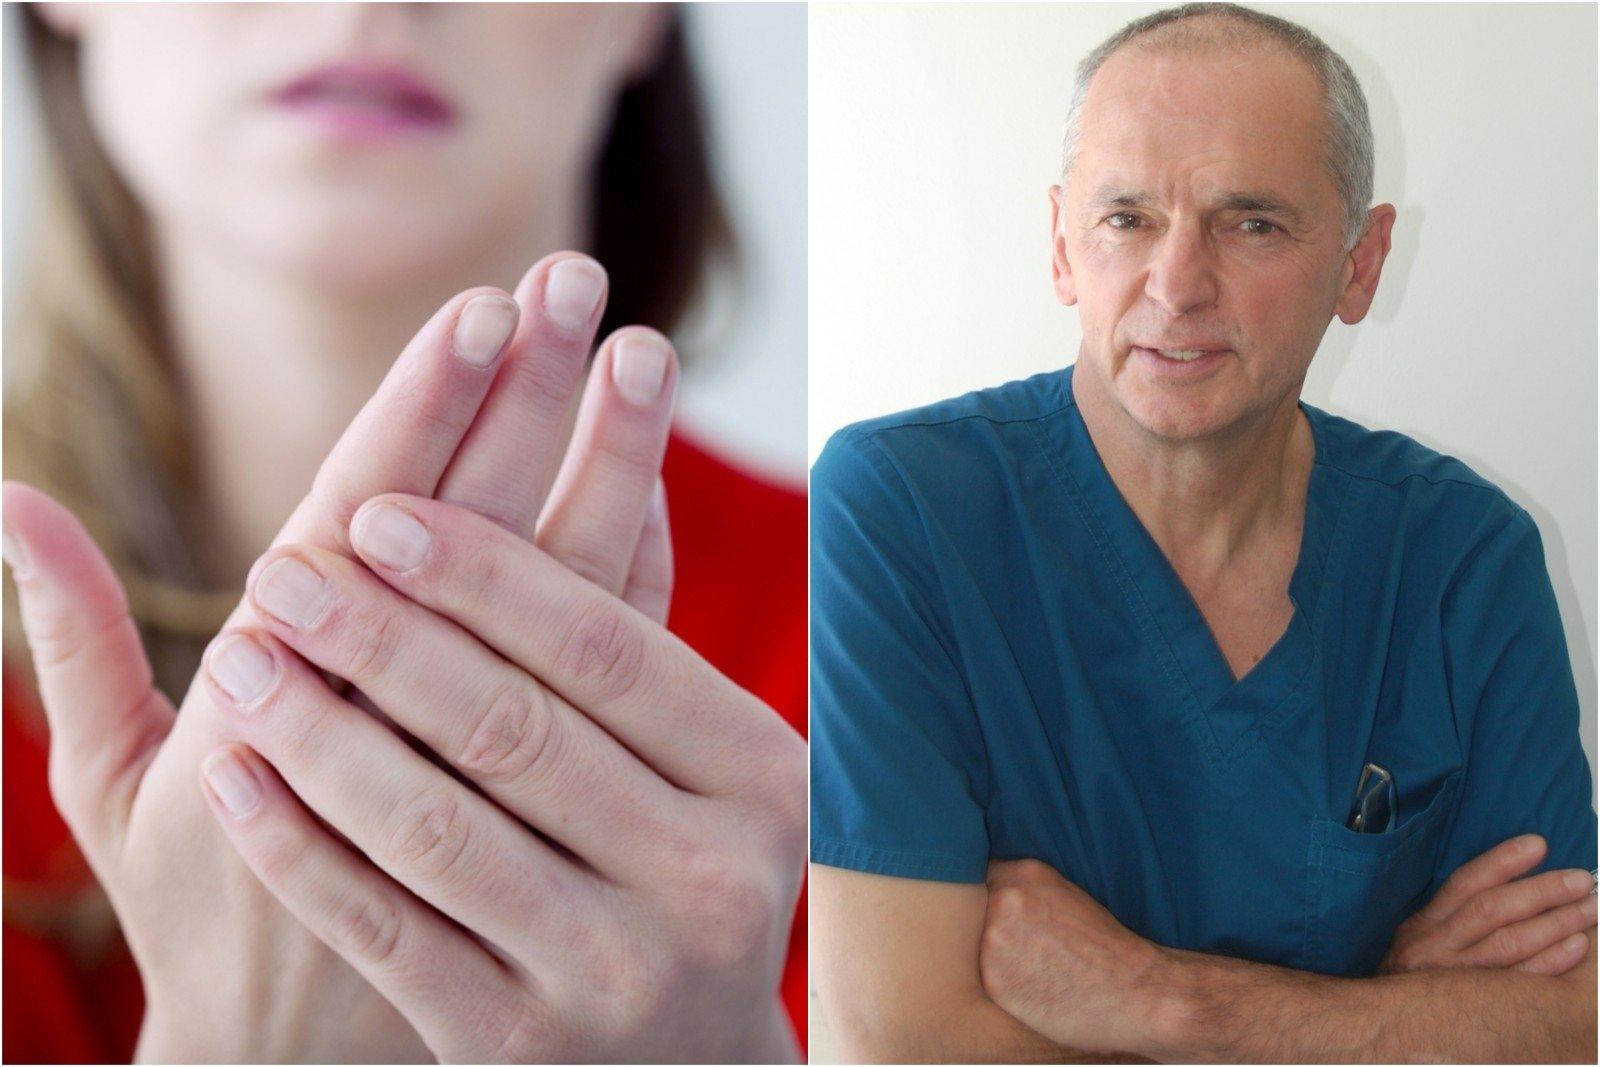 hipertenzija ir rankos nutirpsta)